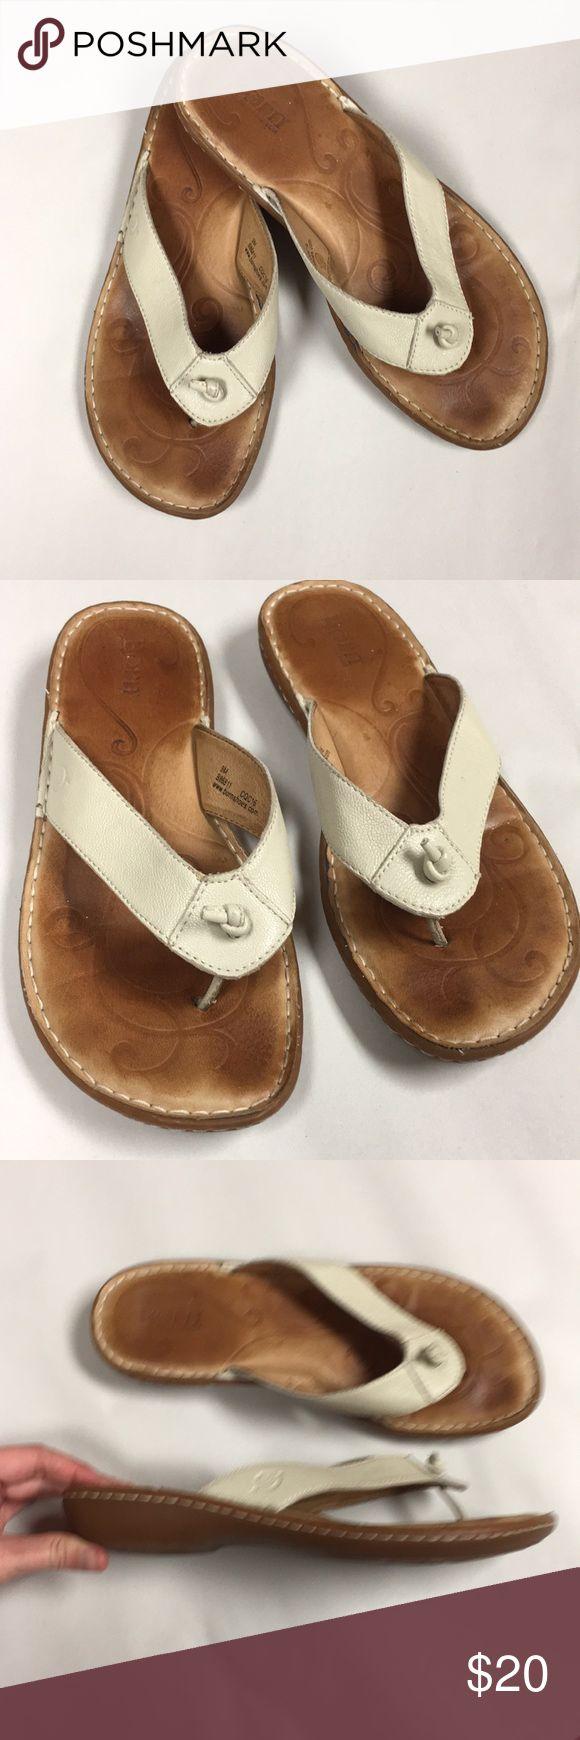 5b685bd1d04e4 Born leather flip flops born white leather flip flops size casual size mesh  terrasoles jpg 580x1740